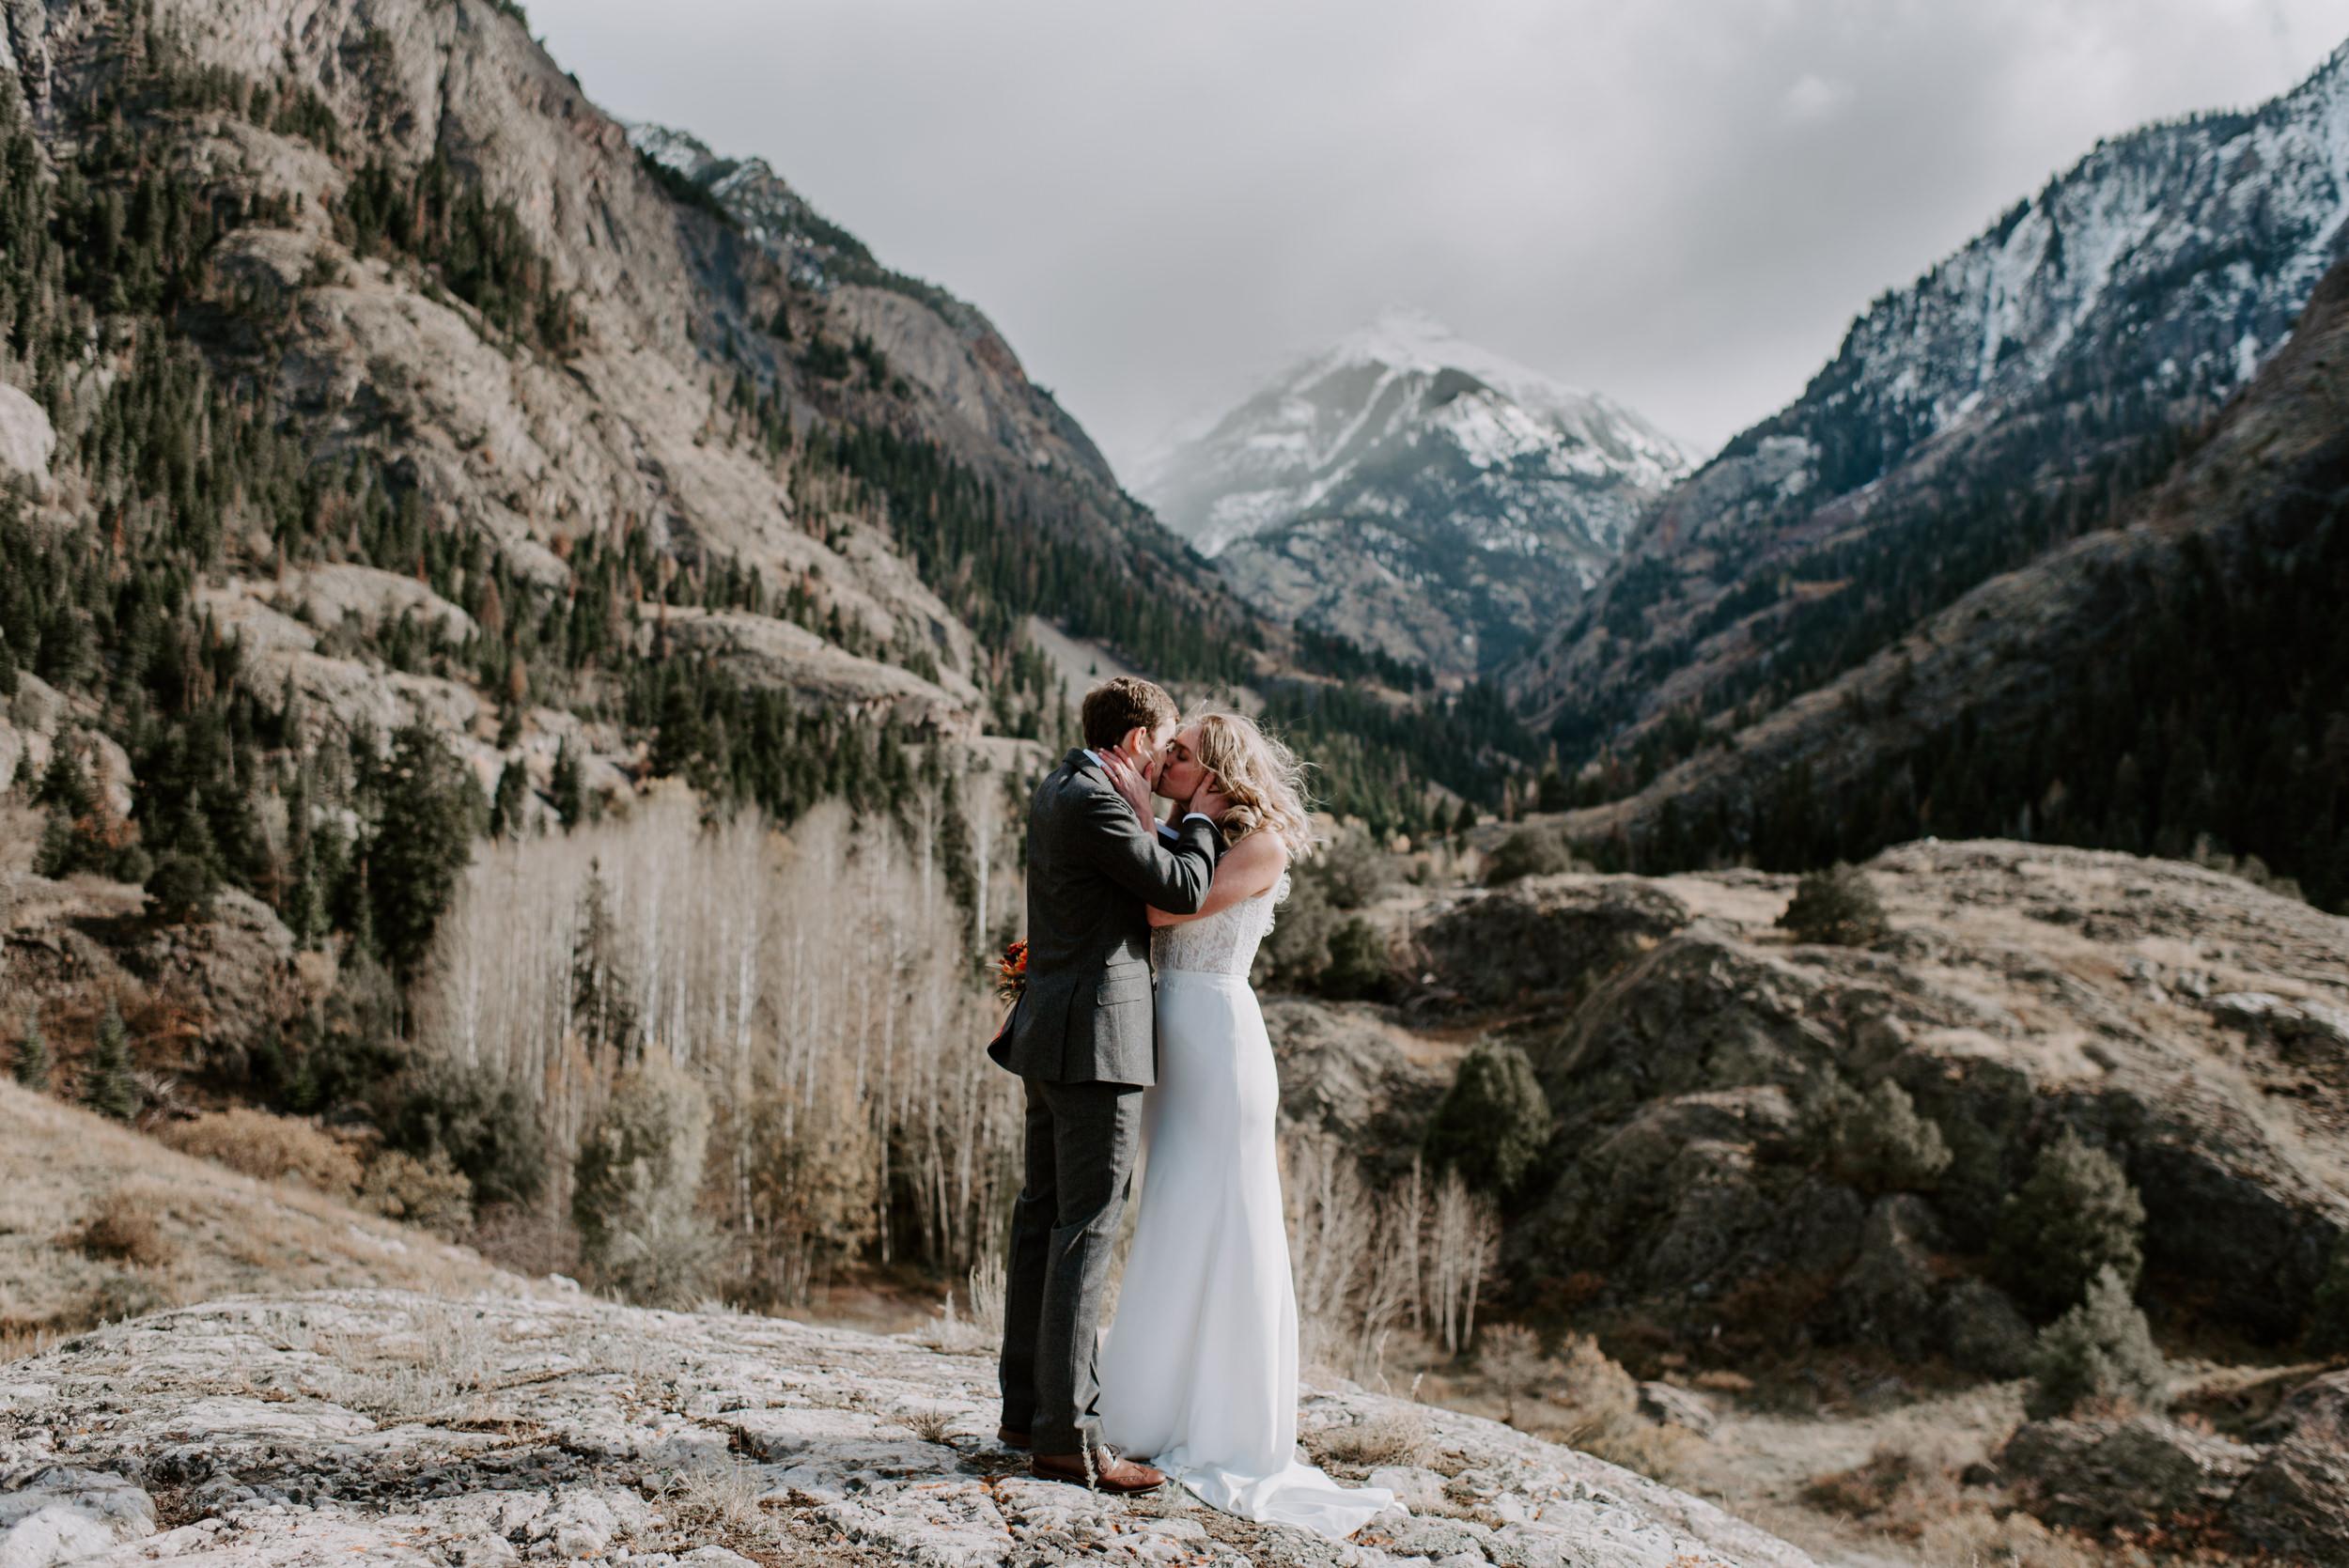 First kiss, Ouray, Colorado elopement. Colorado mountain elopement photographer. Ouray, Colorado adventure elopement. Million Dollar Highway elopement.